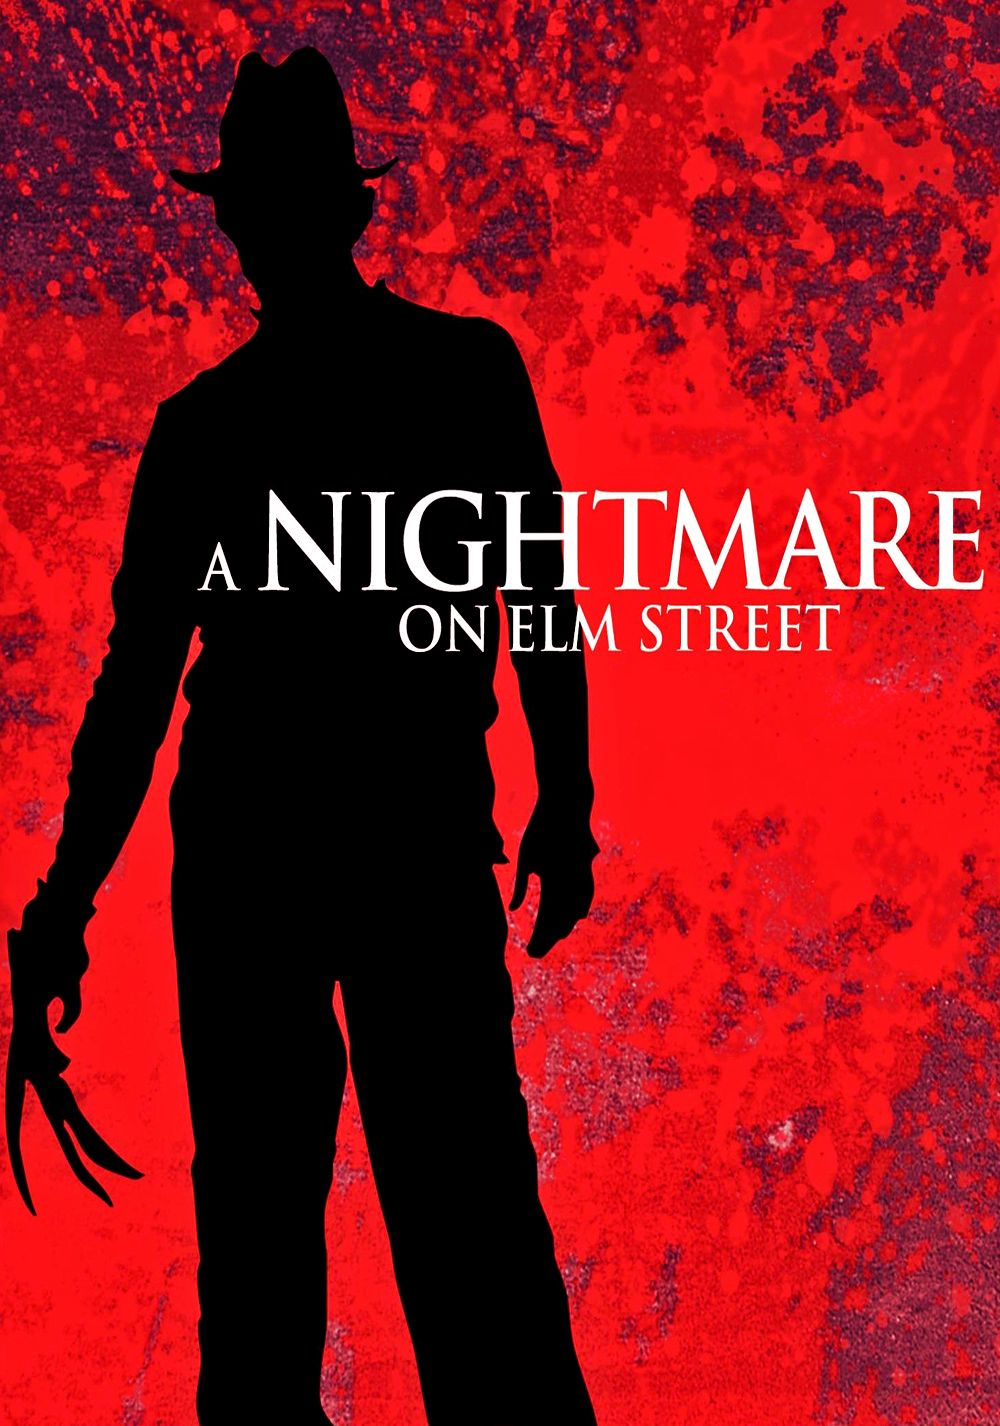 A Nightmare on Elm Street movie poster image